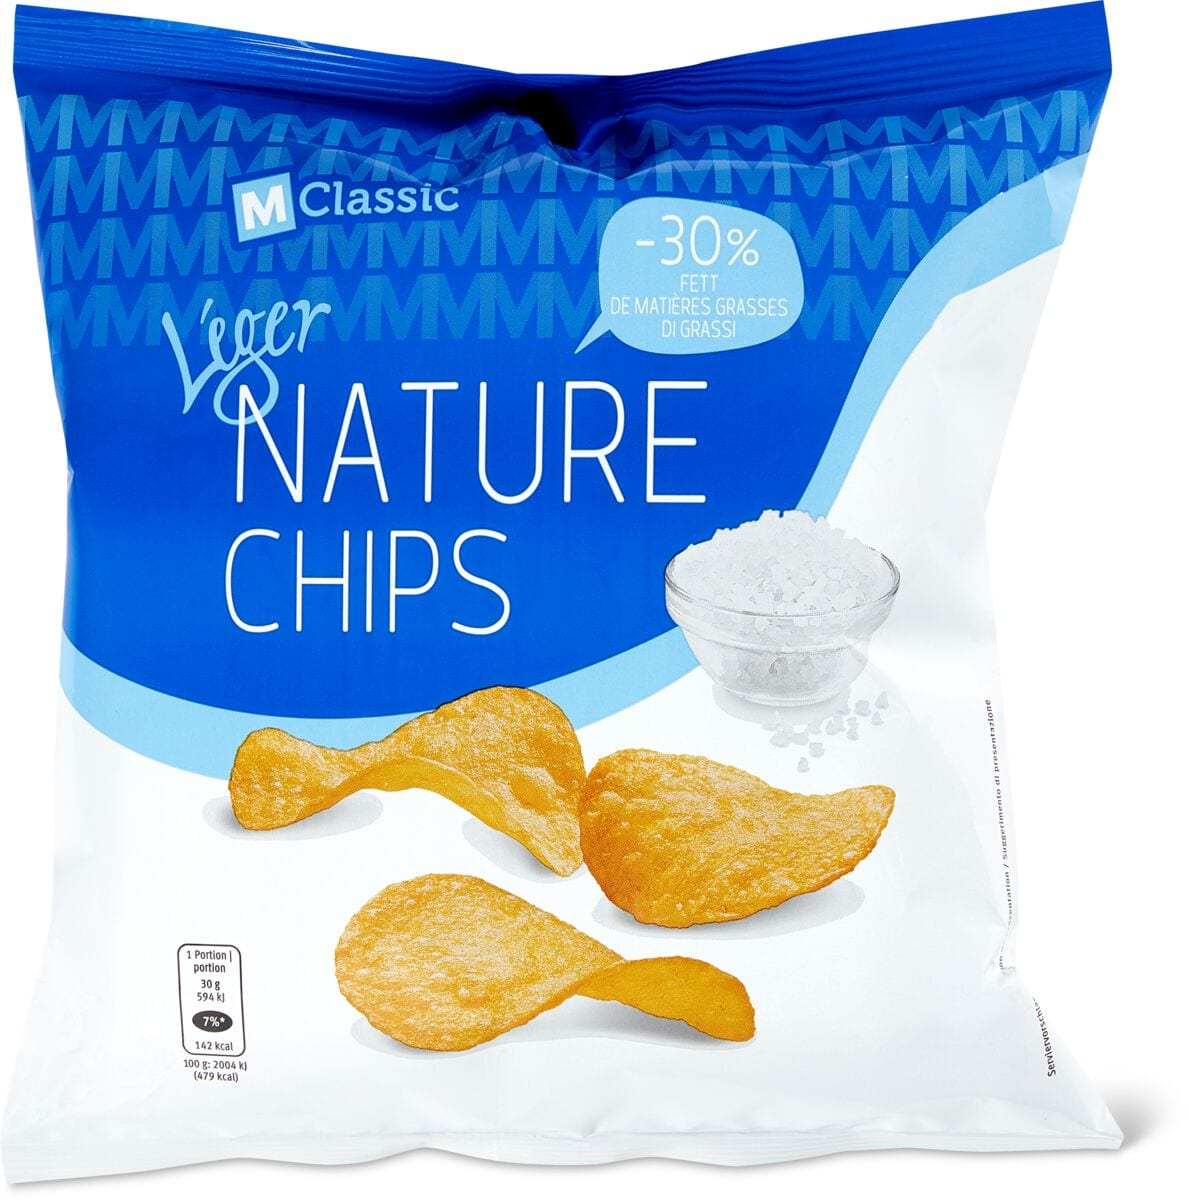 M-Classic Léger Nature Chips